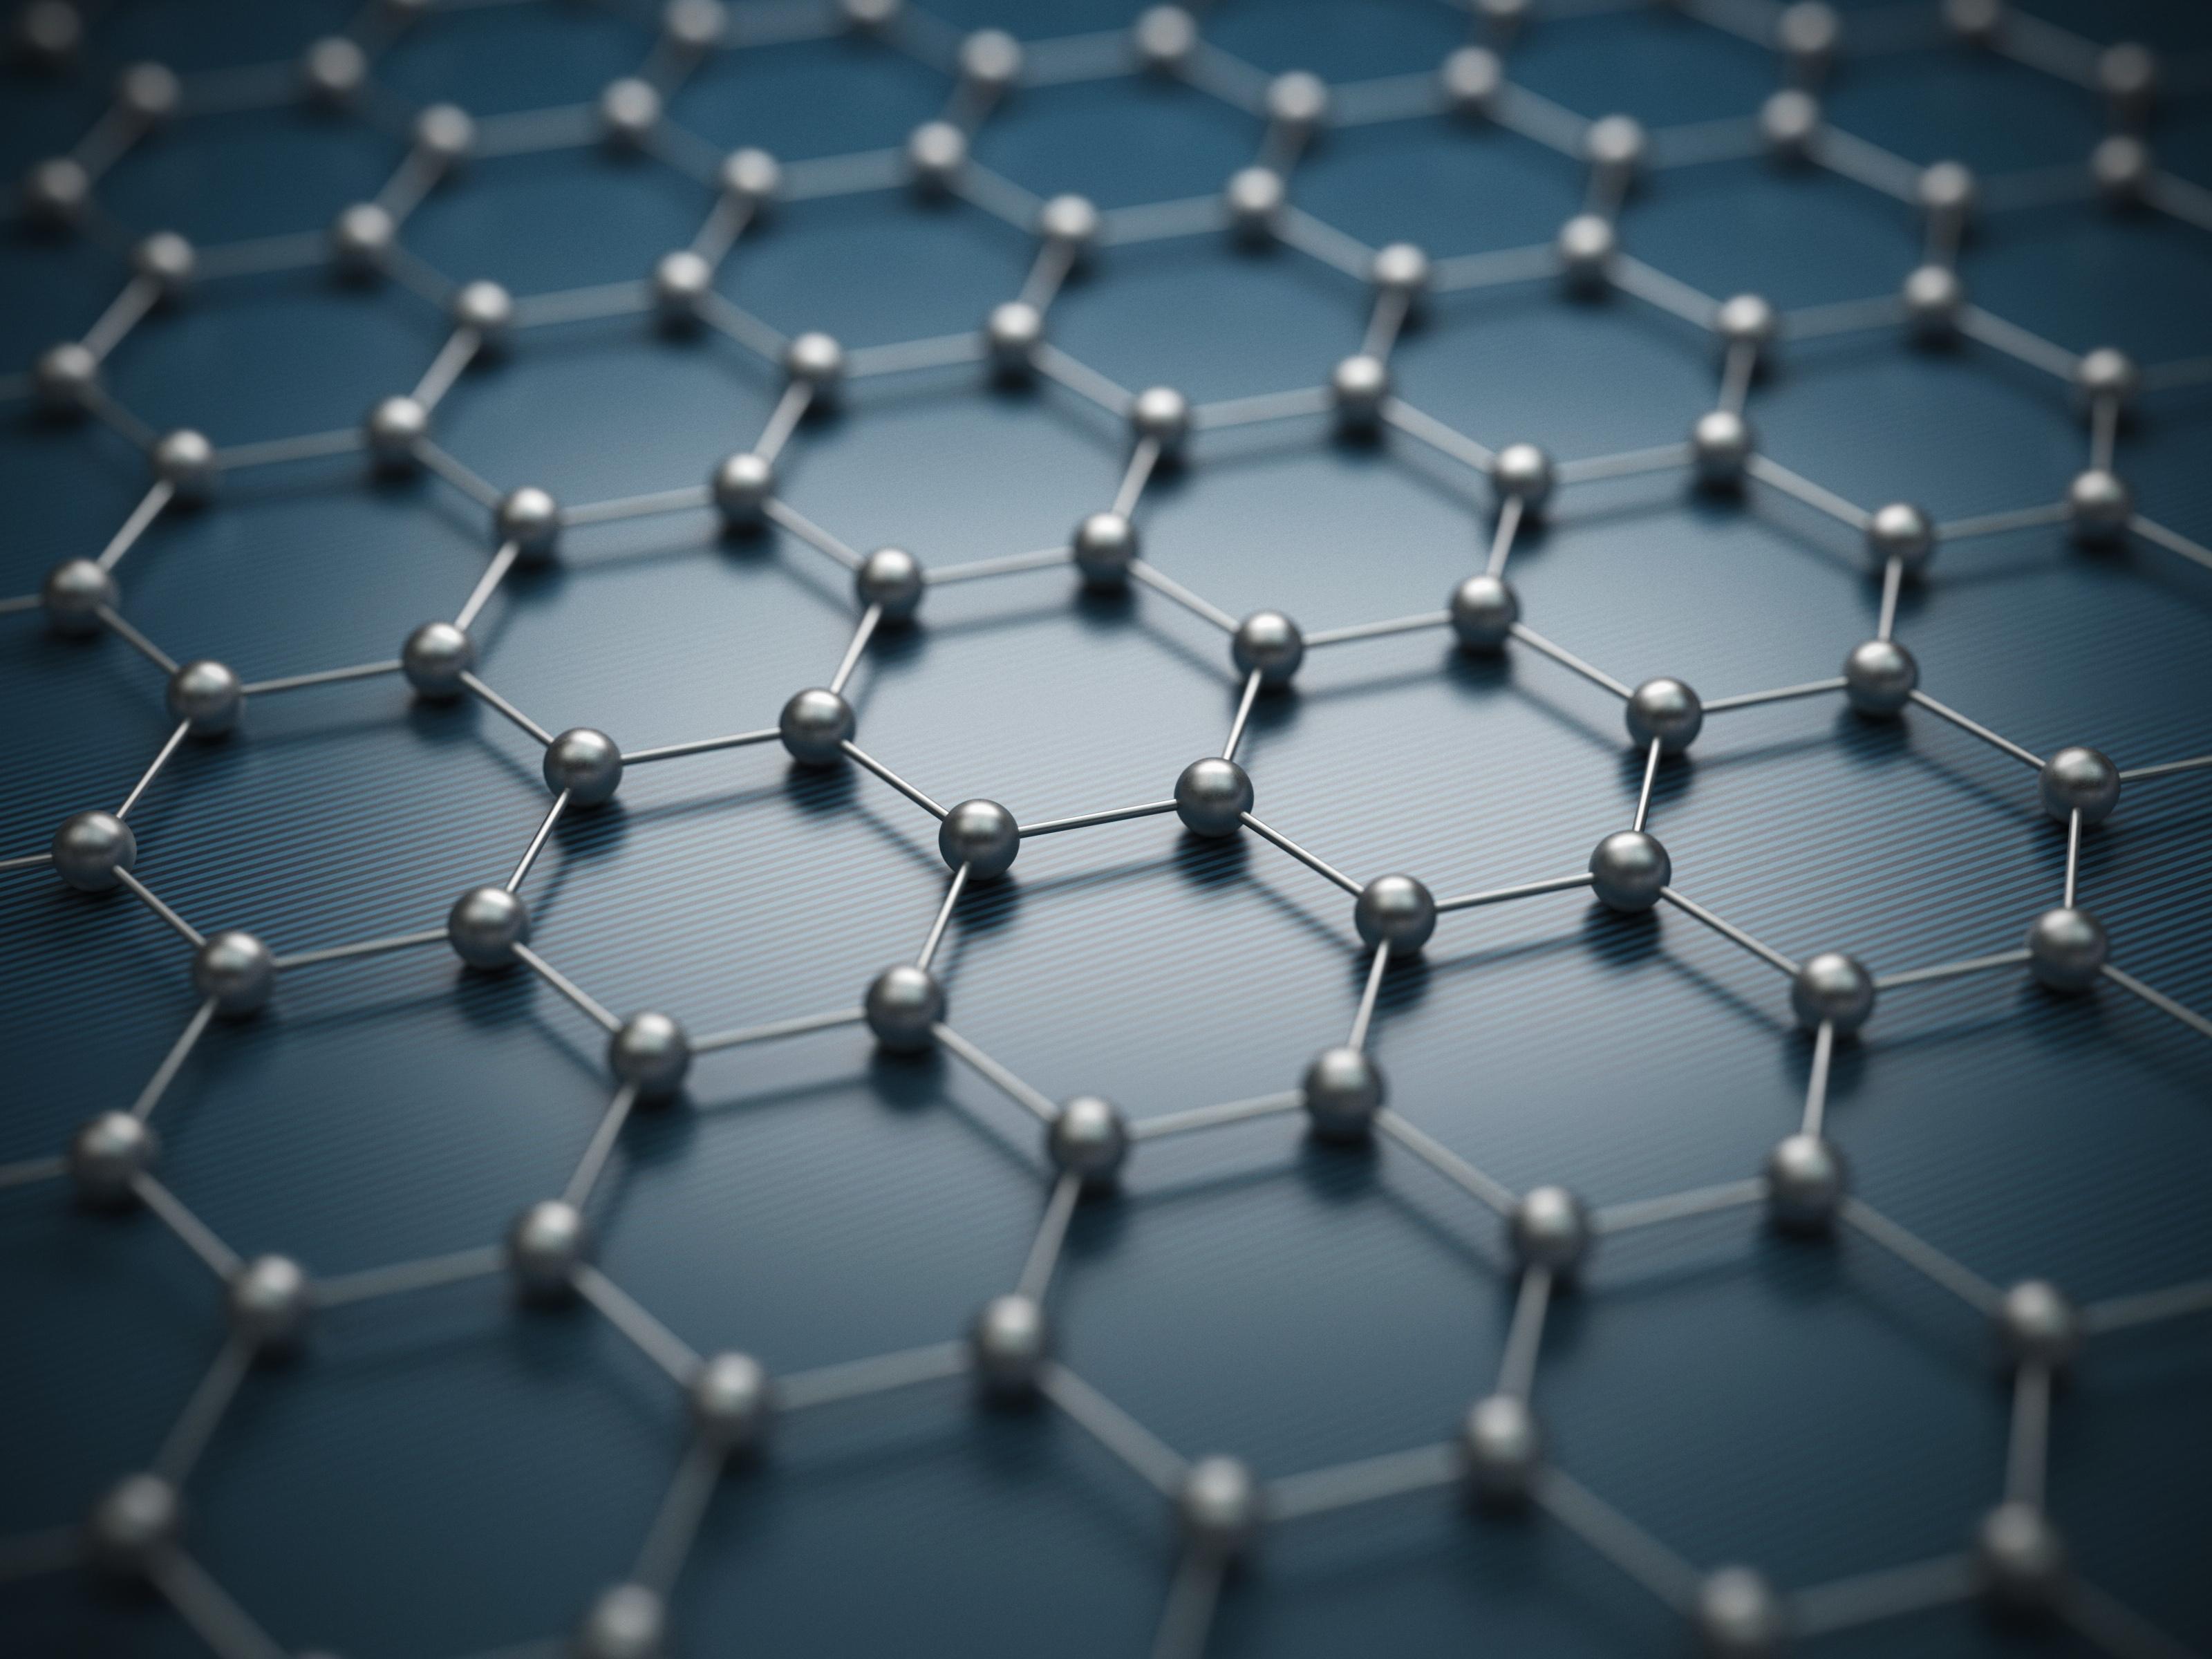 Graphene molecular grid, graphene atomic